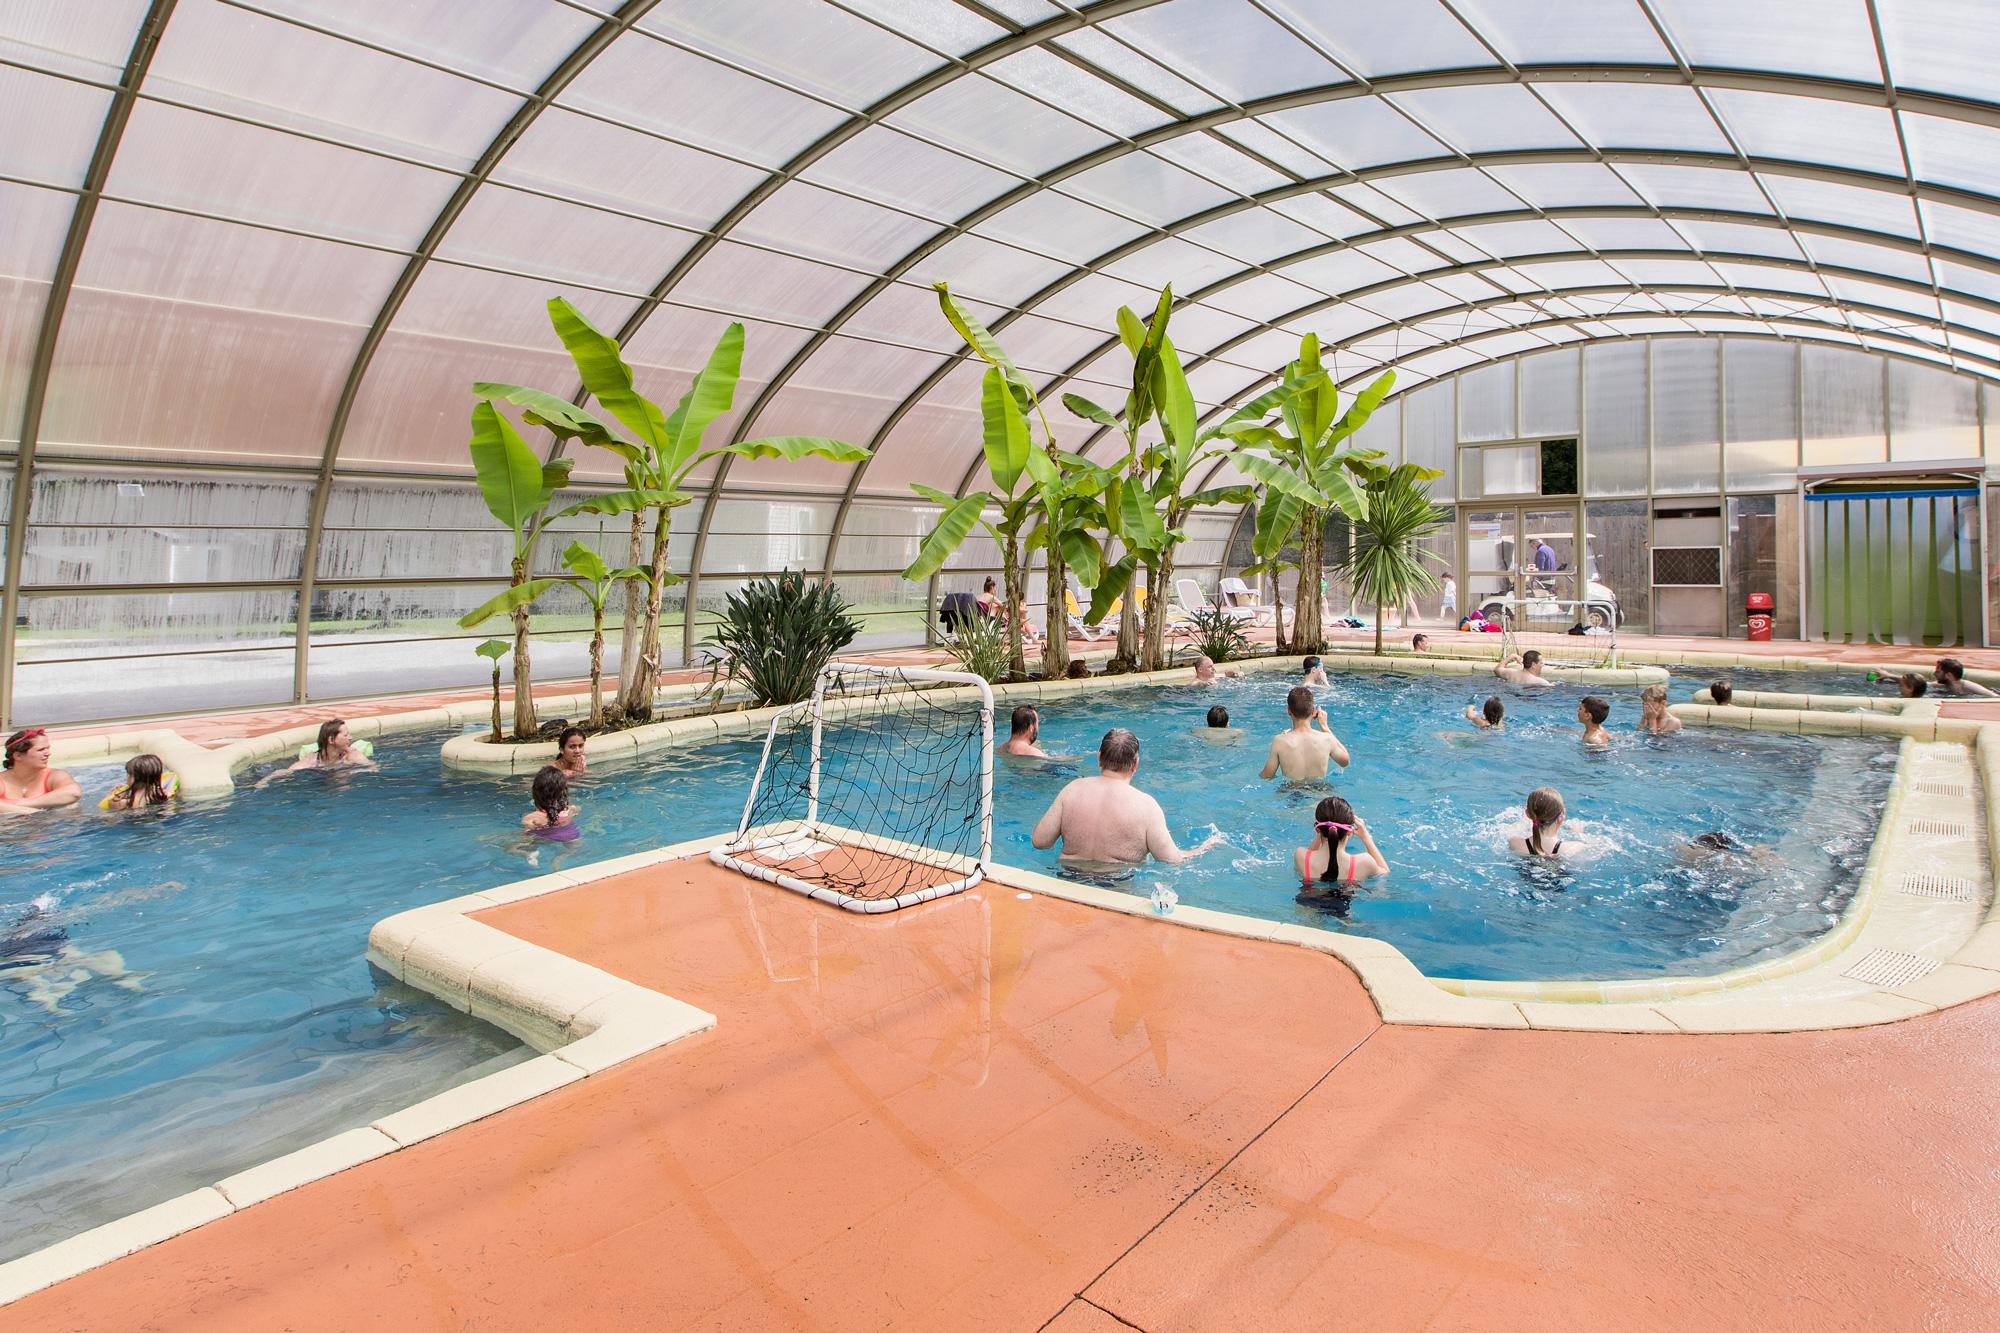 Camping piscine chauff e saint malo complexe aquatique for Camping embrun avec piscine